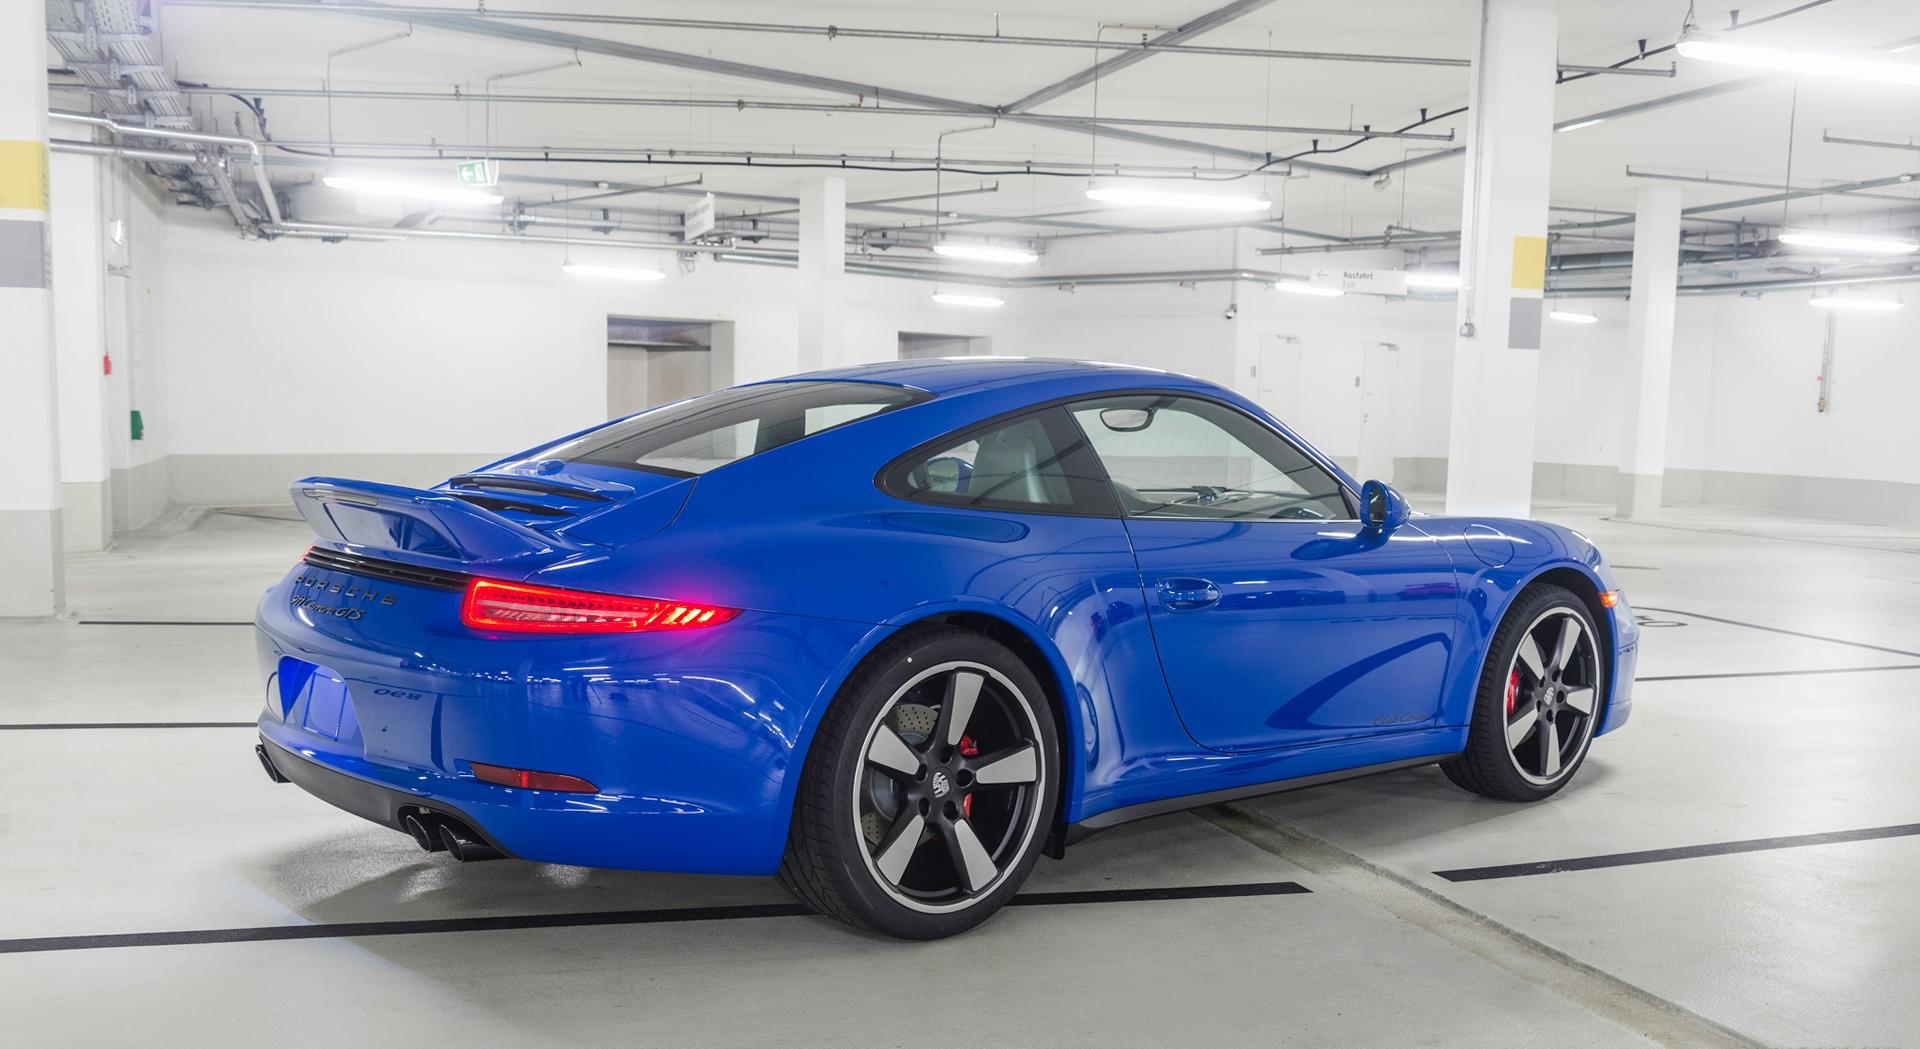 Porsche 911 Blue Pictures Hd Desktop Wallpapers 4k Hd